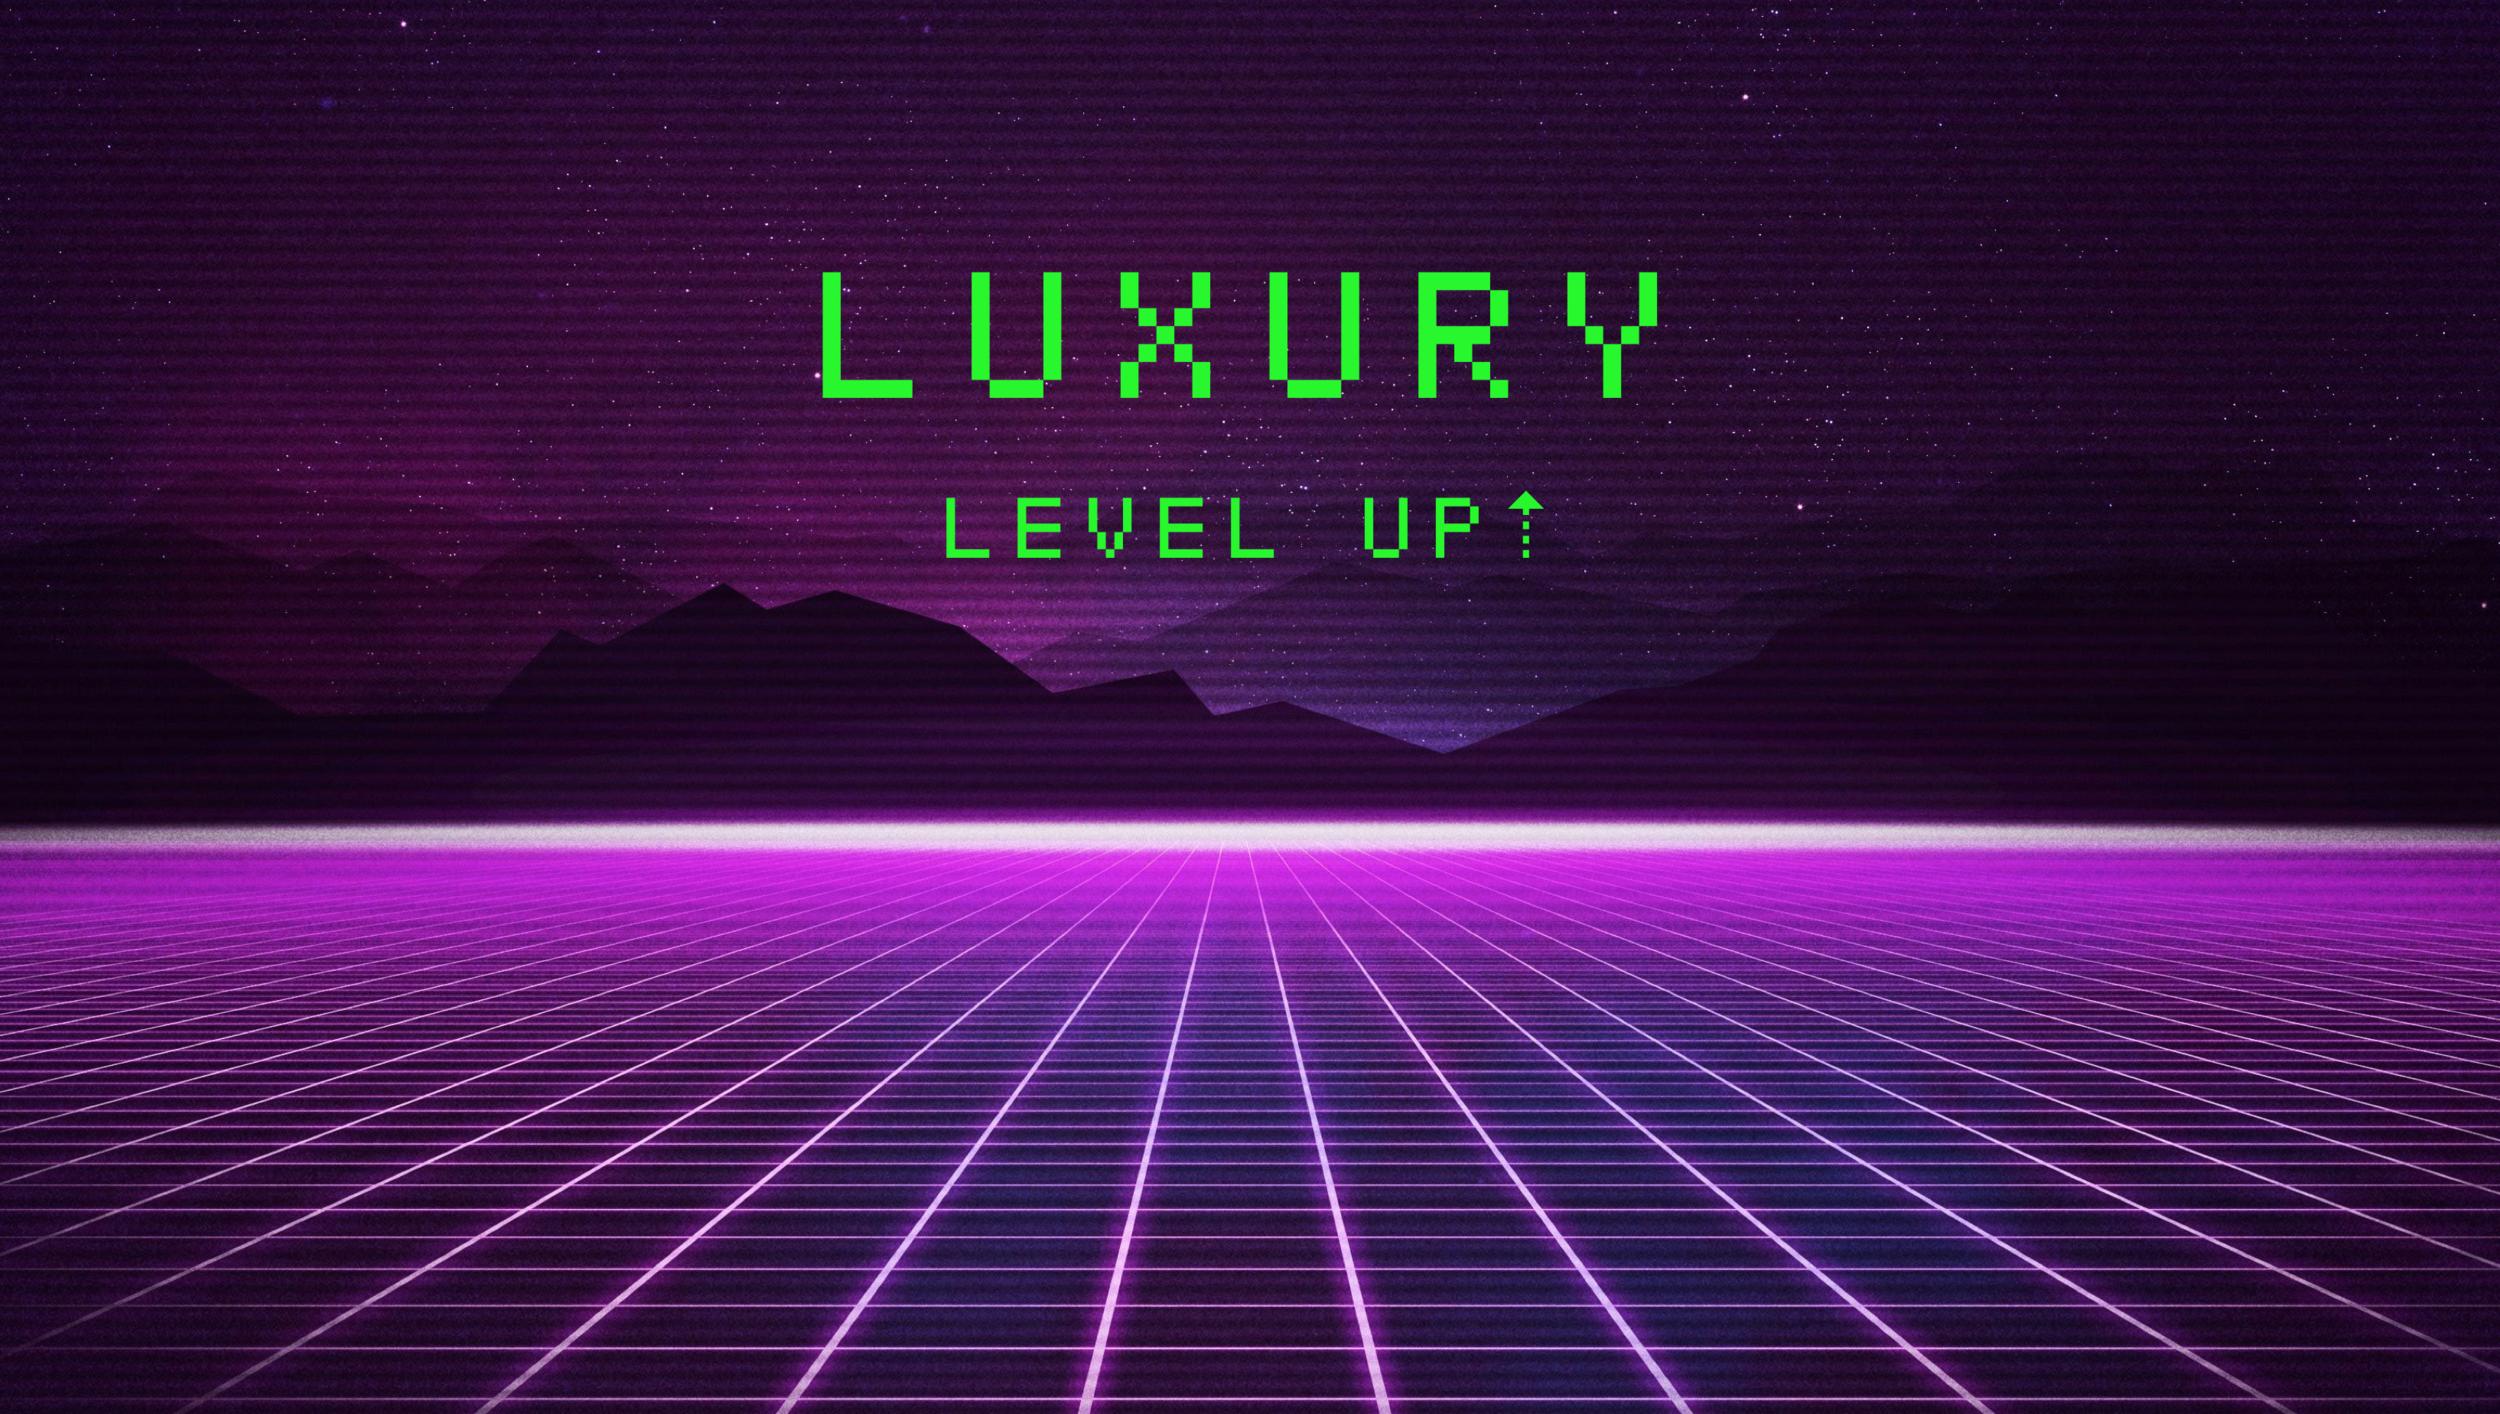 Luxury Lloyd Level Up Your Game